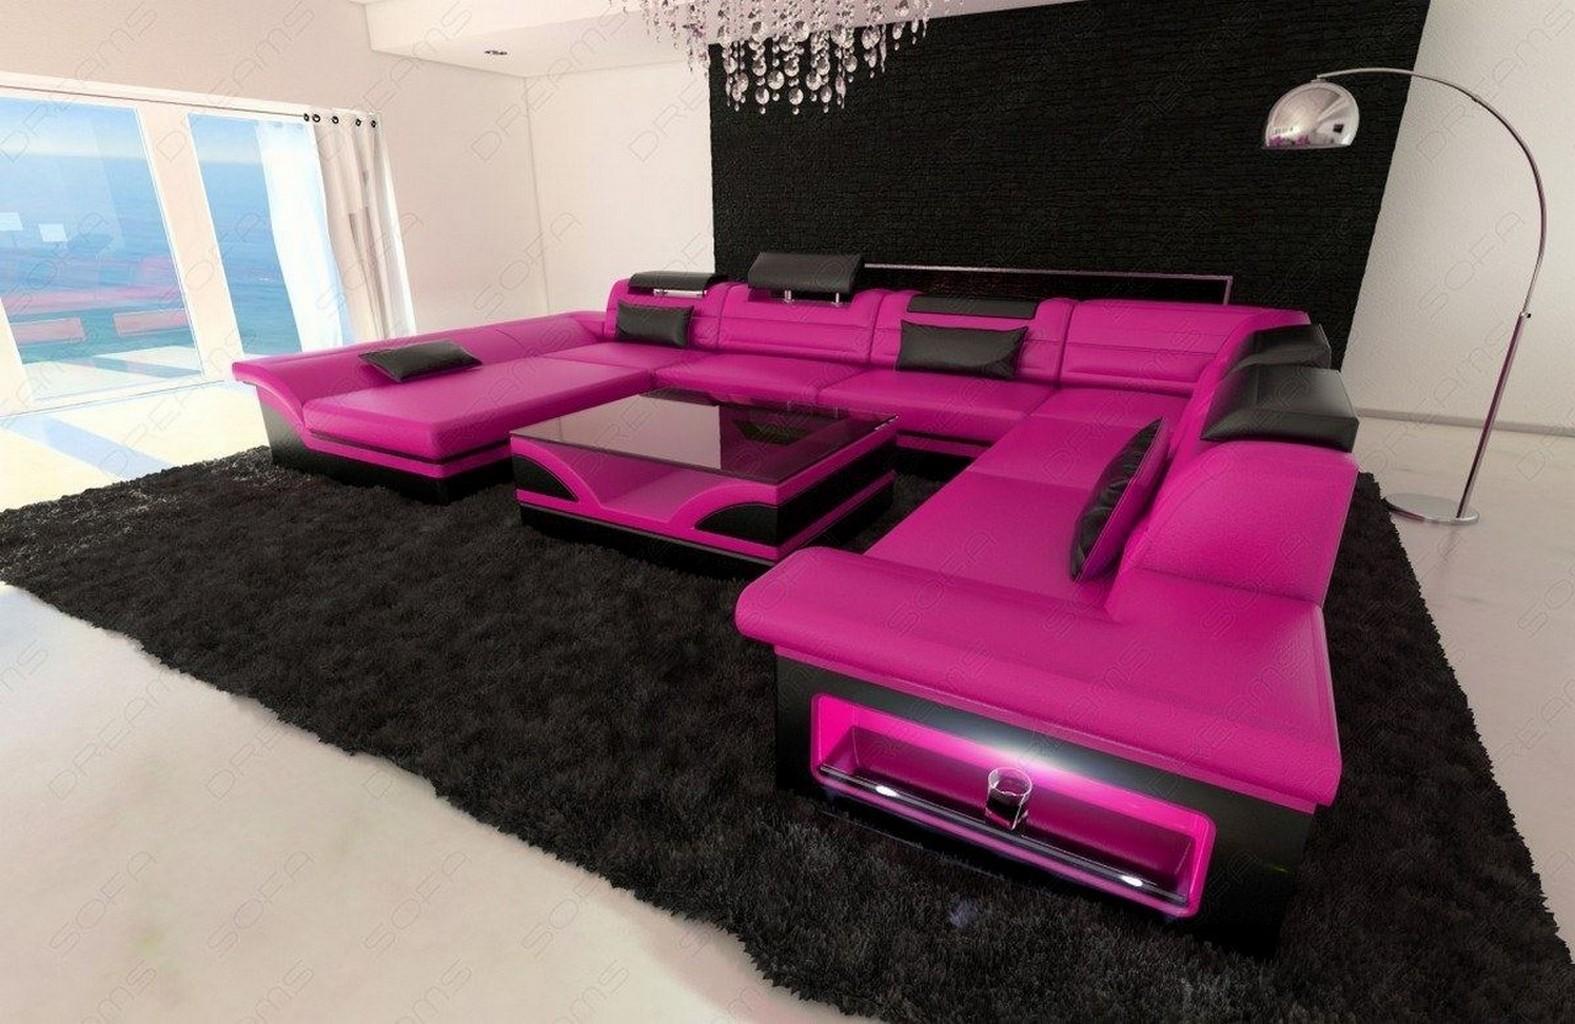 Leather Sectional Sofa ENZO XXL Pink Black EBay